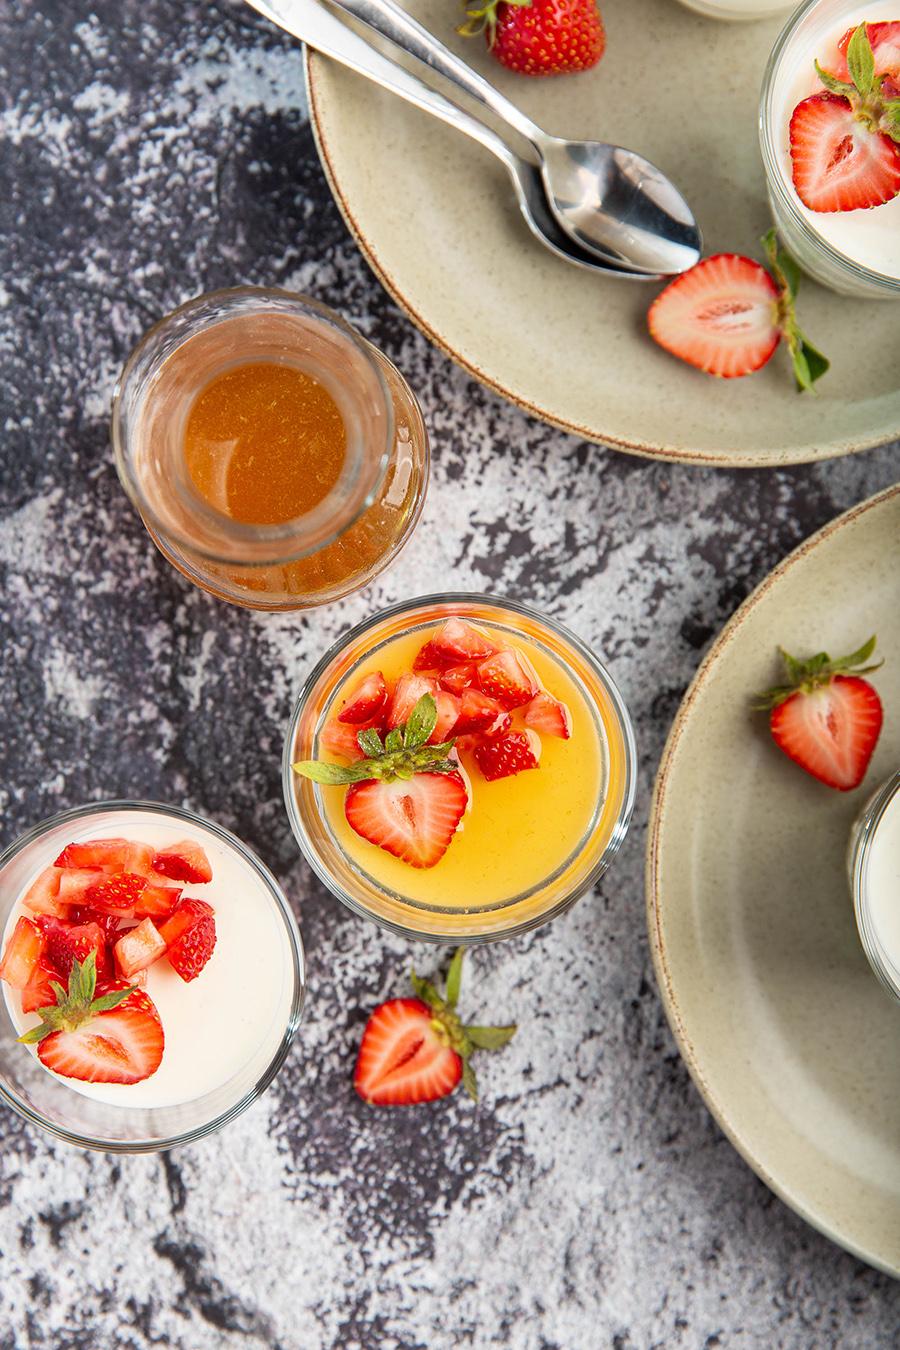 Yogurt Panna Cotta w/ Strawberry & Honey   Silky smooth, creamy, little tangy & sweet. It's an excellent summer dessert. #pannacotta #honey #greekyogurt #nobake #gelatin #strawberry #dessert #dessertrecipe #easyrecipe #dinnerparty #makeahead   The Missing Lokness